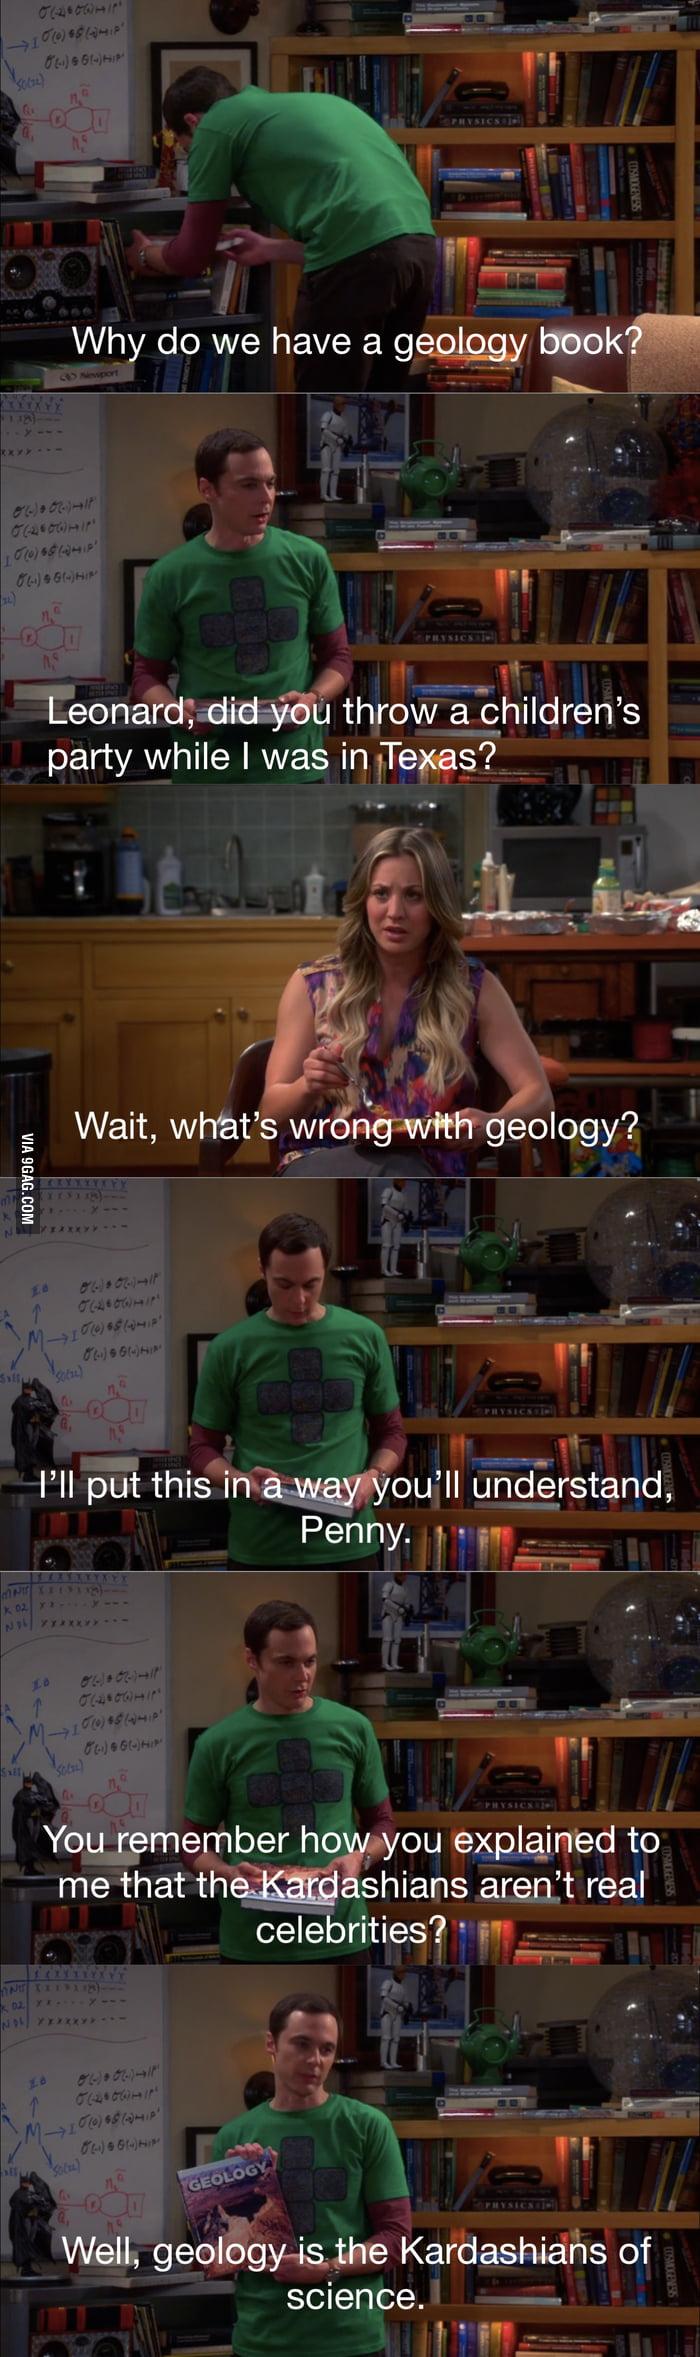 Sheldon's opinion on geology